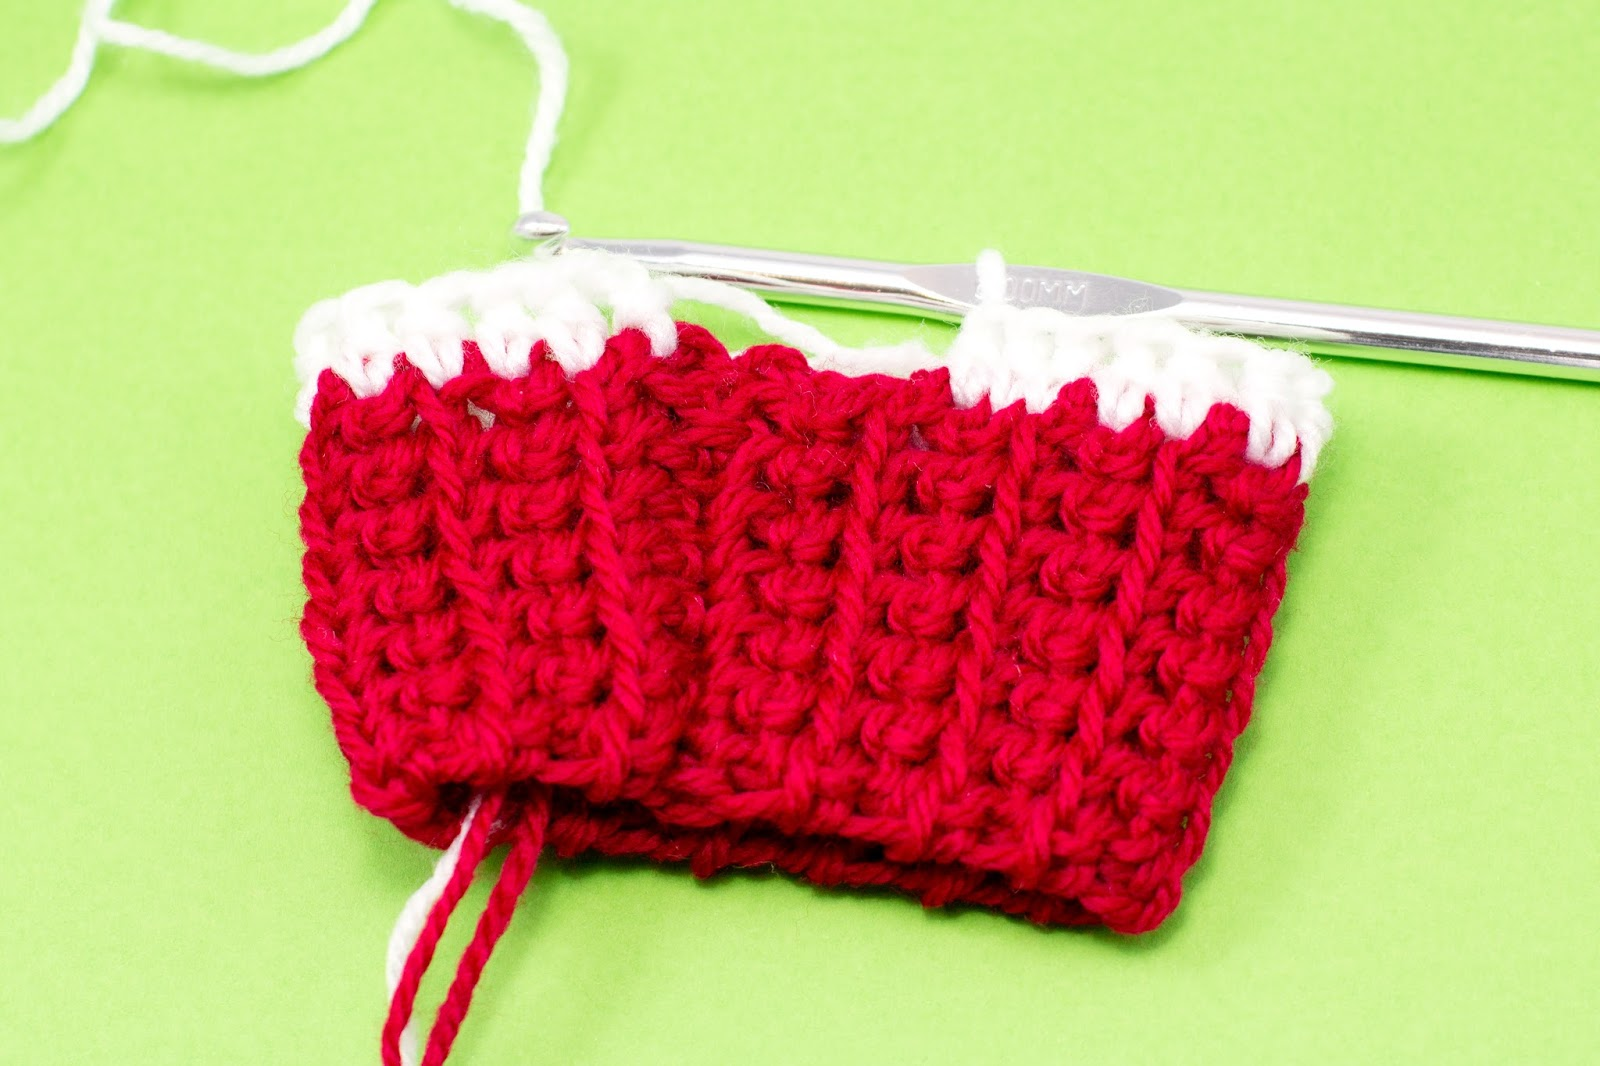 Craft crochet create adult candy cane leg warmers crochet pattern